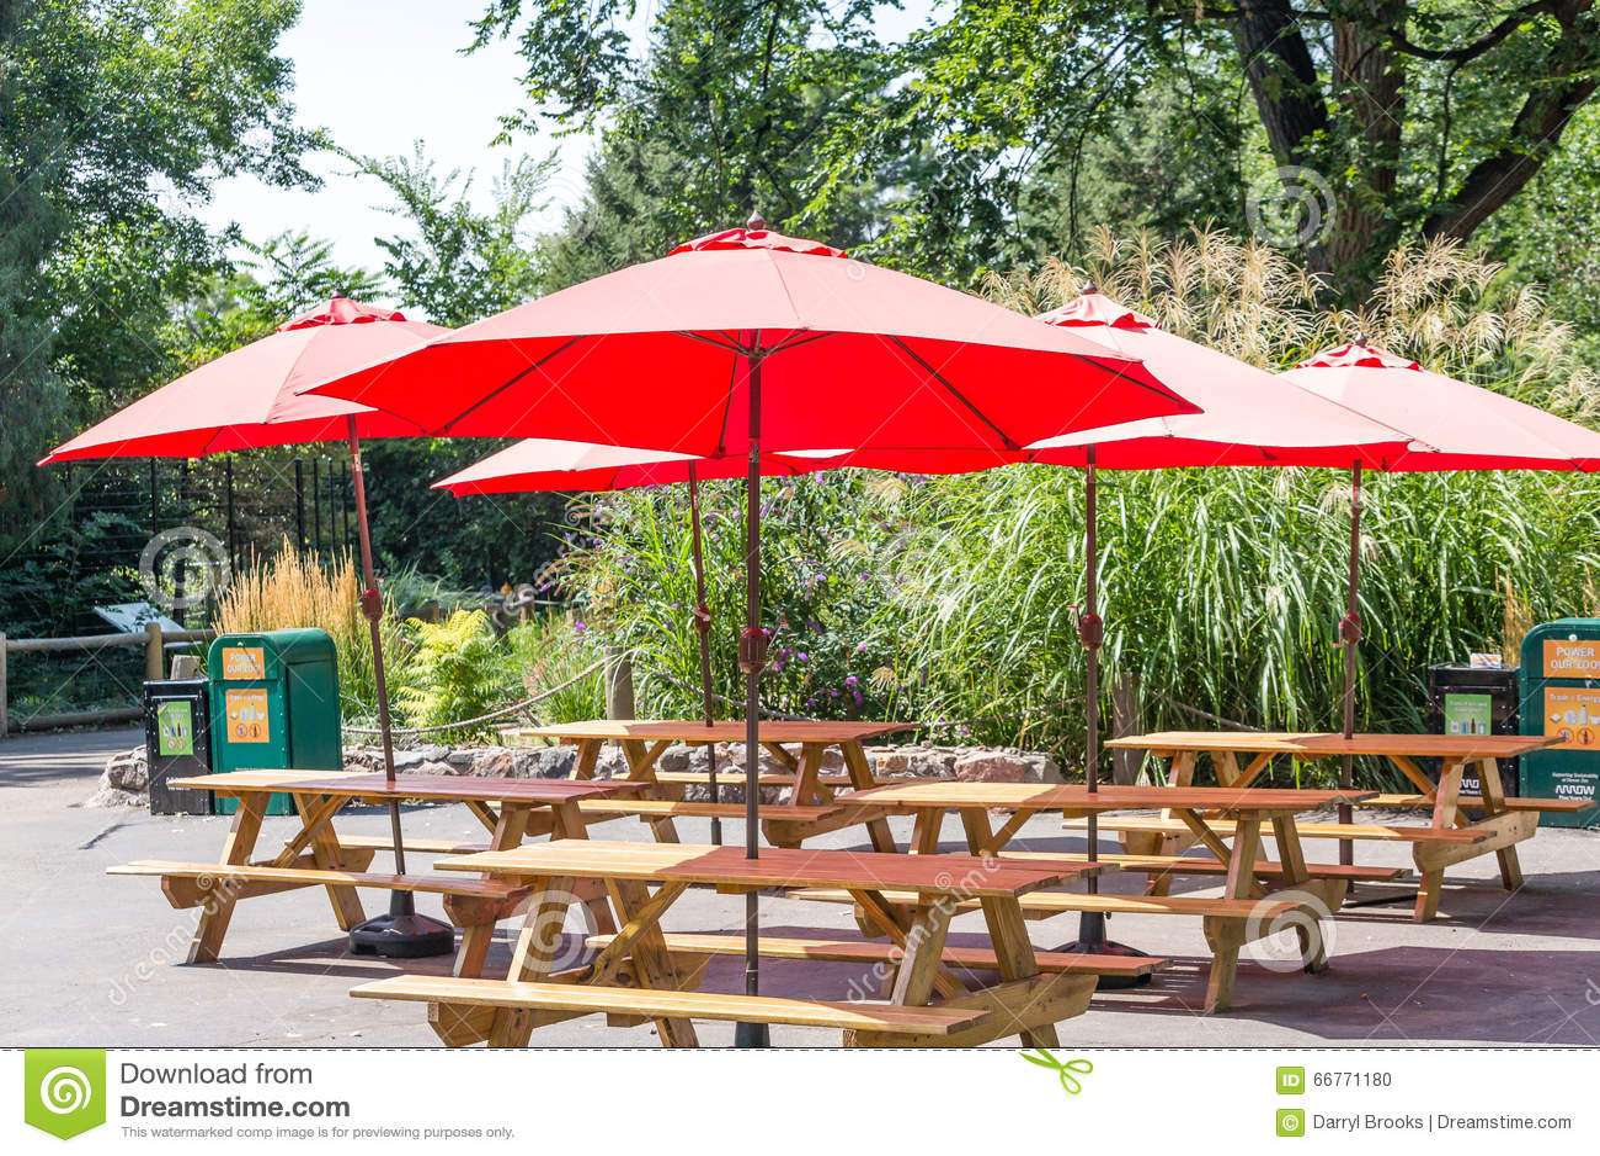 Elegant Red Umbrellas Over Wood Picnic Tables